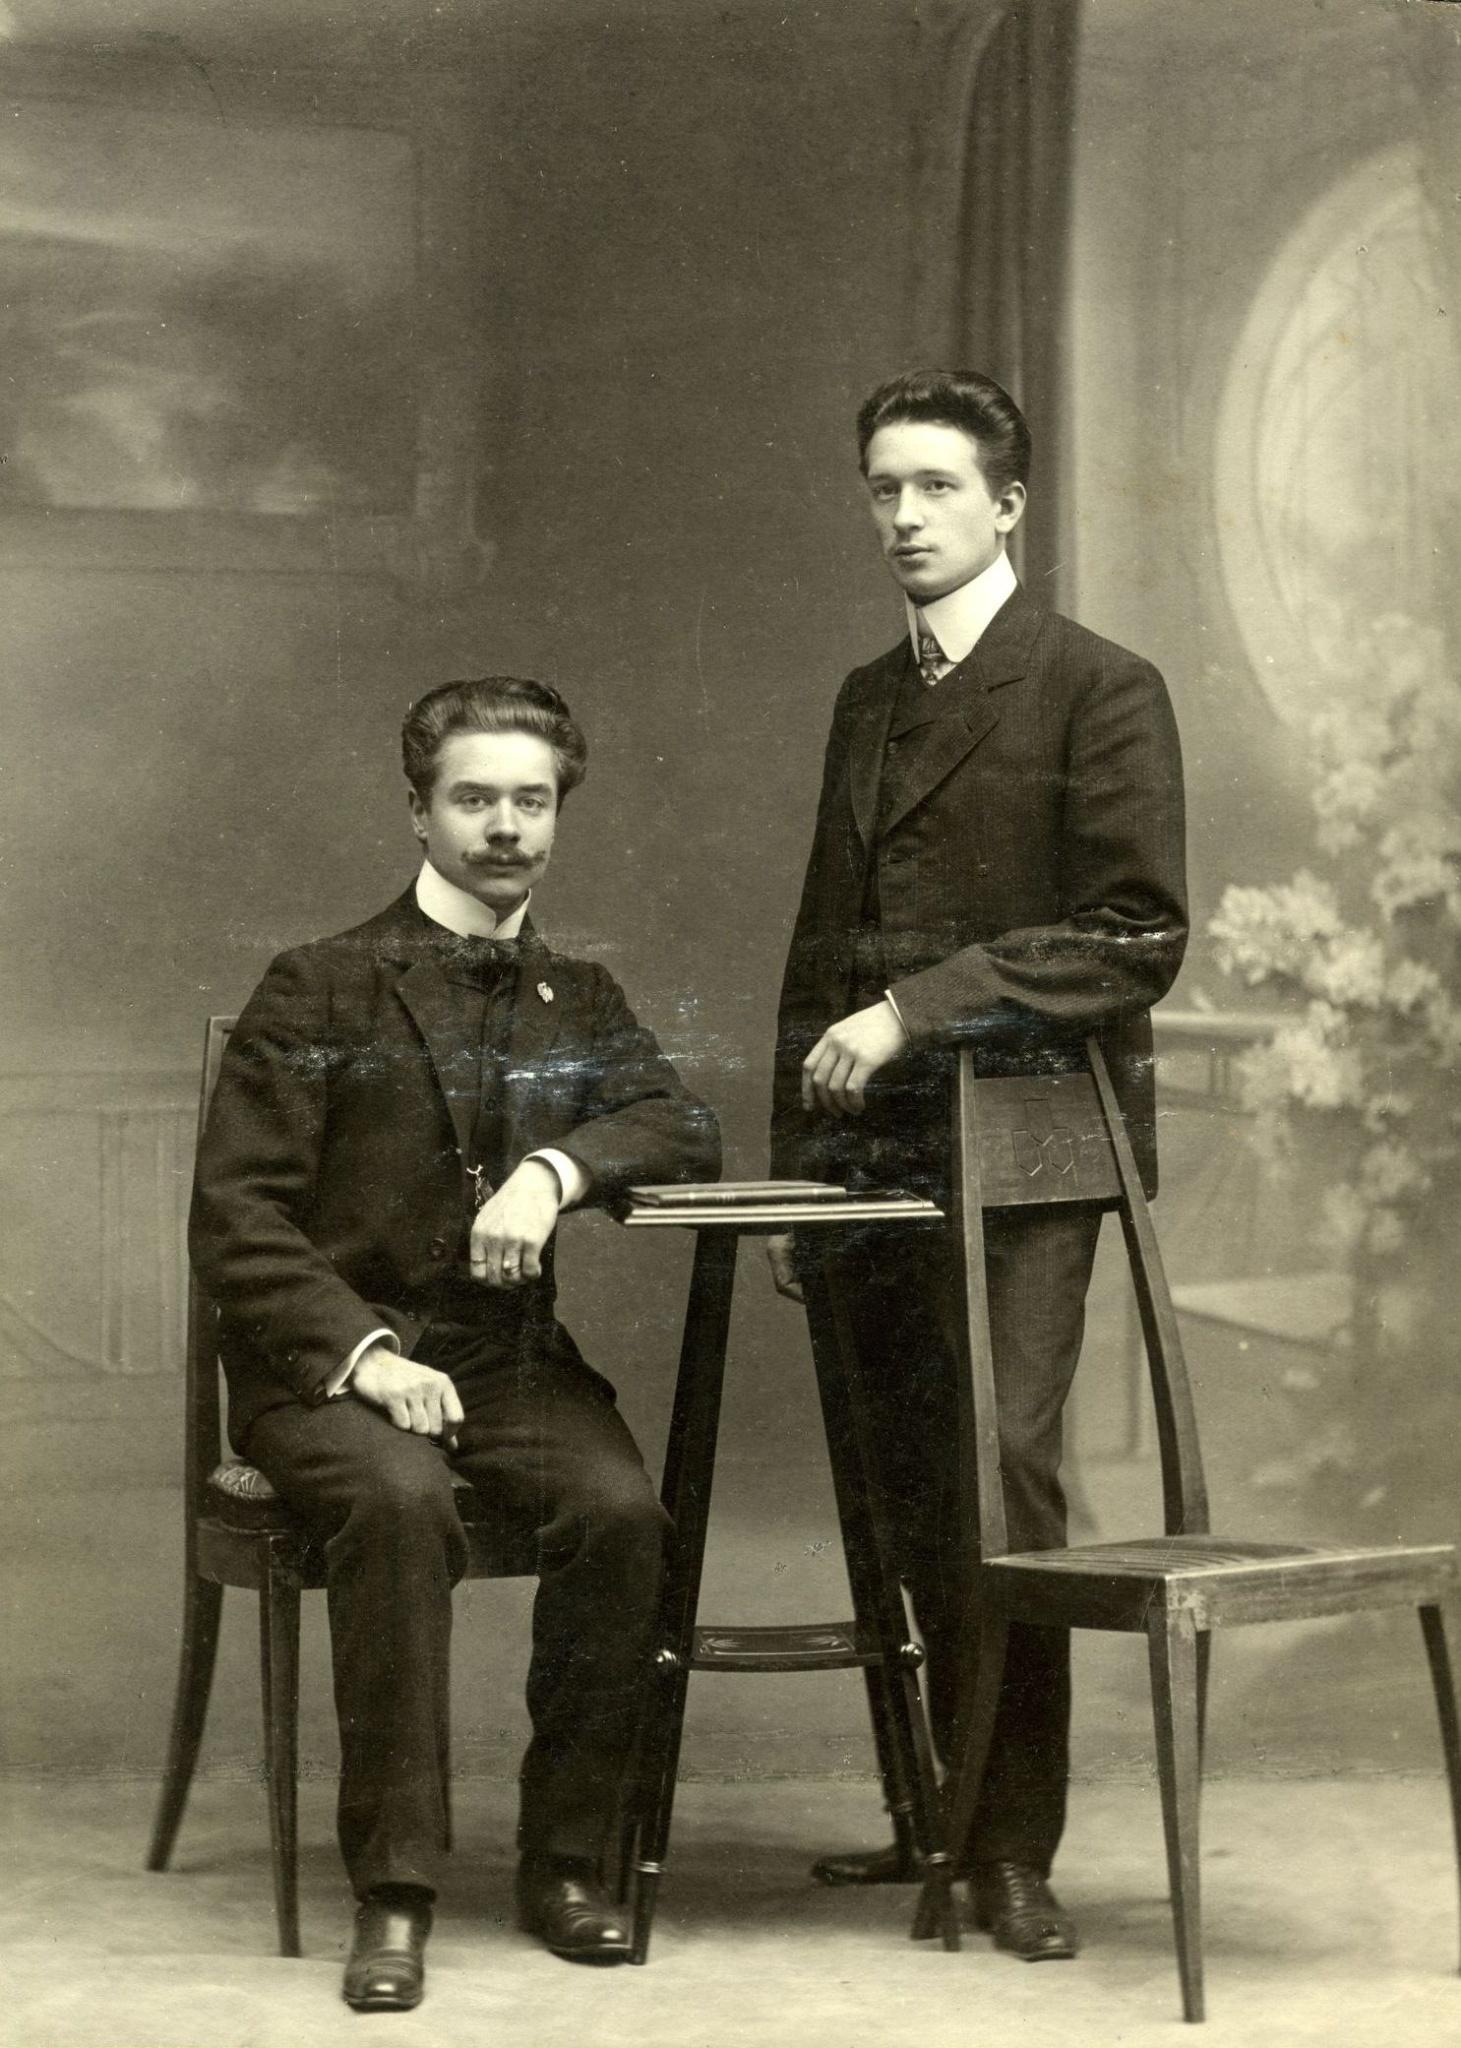 <div class='inner-box'><div class='close-desc'></div><span class='opis'>Ignacy Giedroyć. Moskwa, zdjęcie z lat 1900-1920</span><div class='clearfix'></div><span>Archive ref. FIL03435</span><div class='clearfix'></div><span>© Instytut Literacki</span></div>